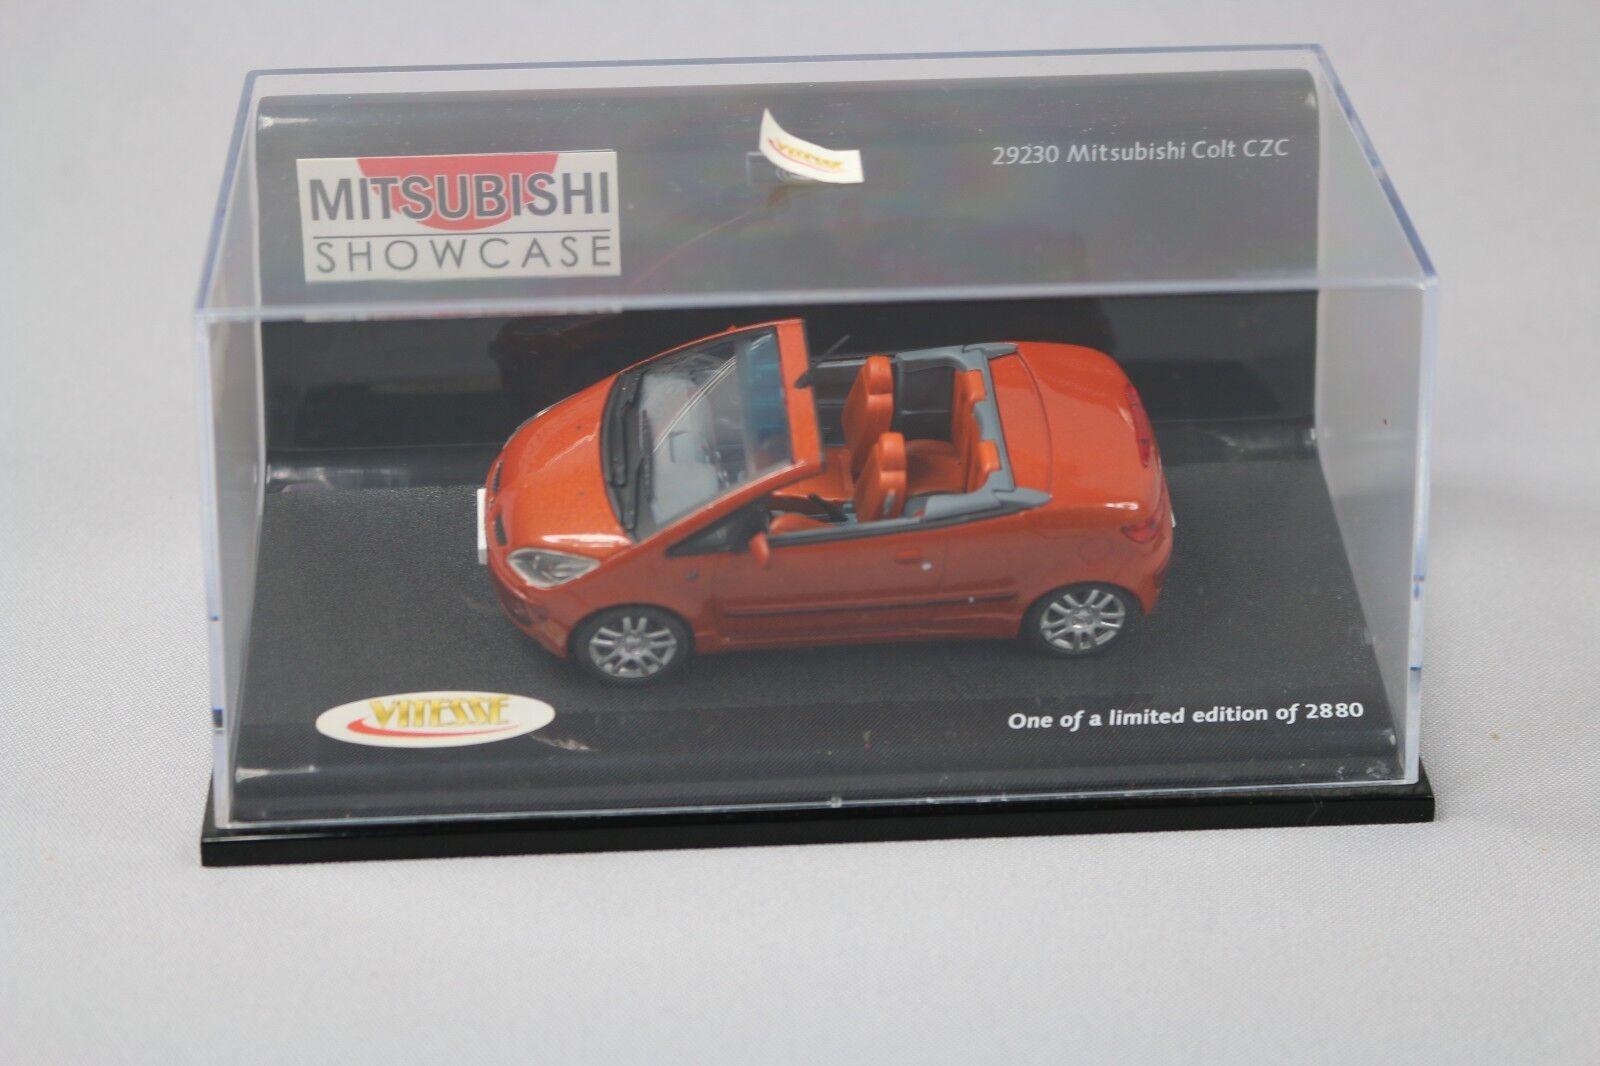 ZC1017 Vitesse 29230 Voiture miniature 1 43 Mitsubishi Colt CZC Limited Edition